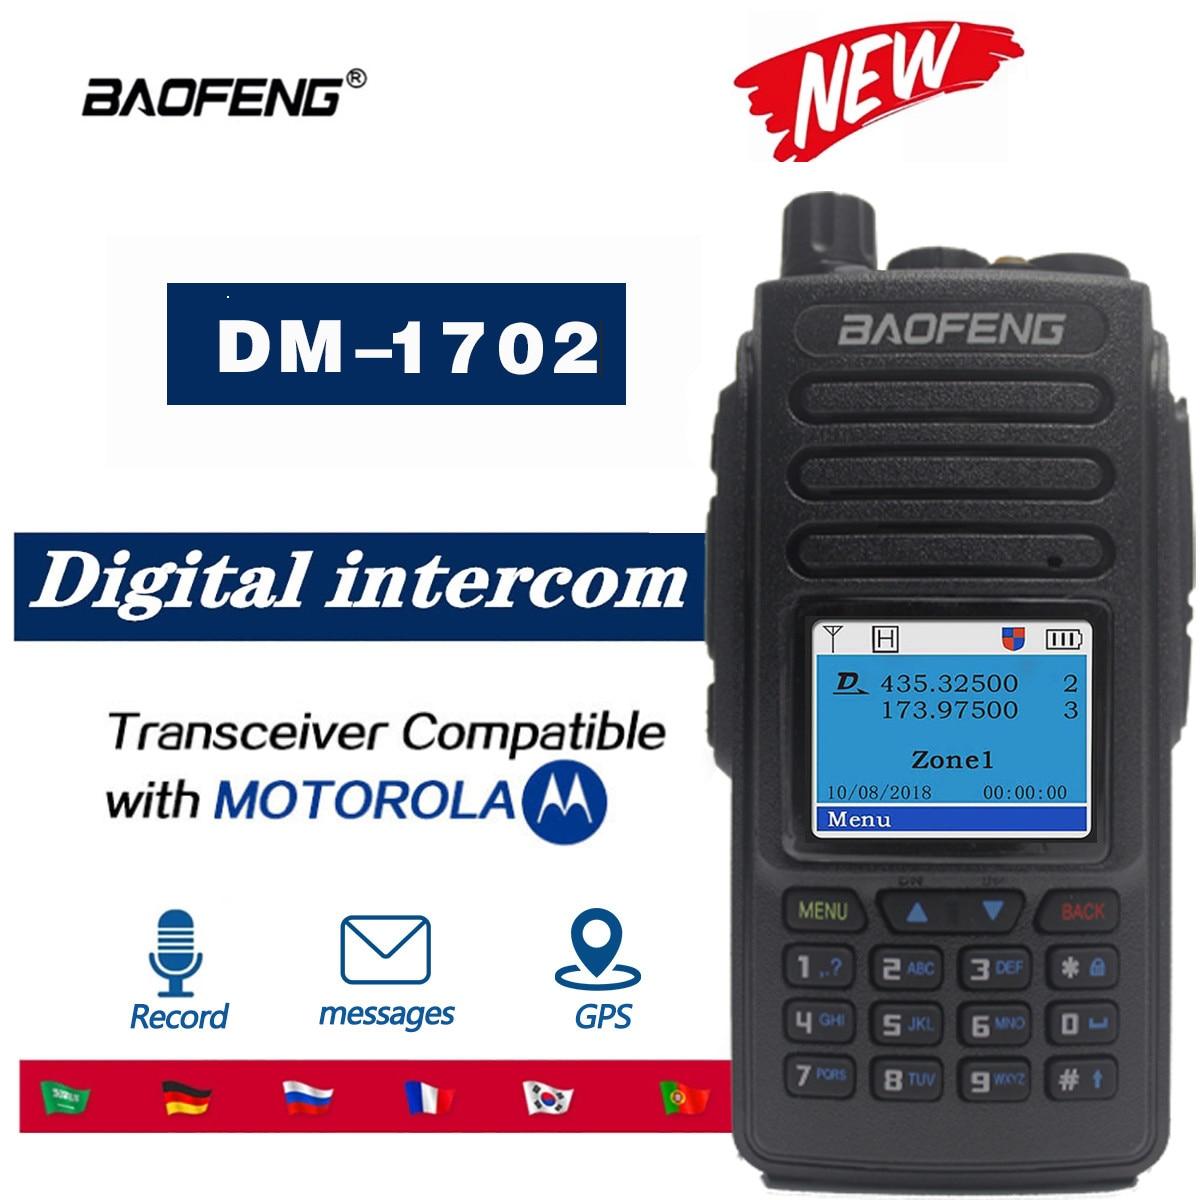 2021 Baofeng DM1701//DM-1702 GPS Walkie Talkie Dual Time Slot DMR Digital/Analog DMR Repeater Upgrade of DM-1801 DM-1701 Radio